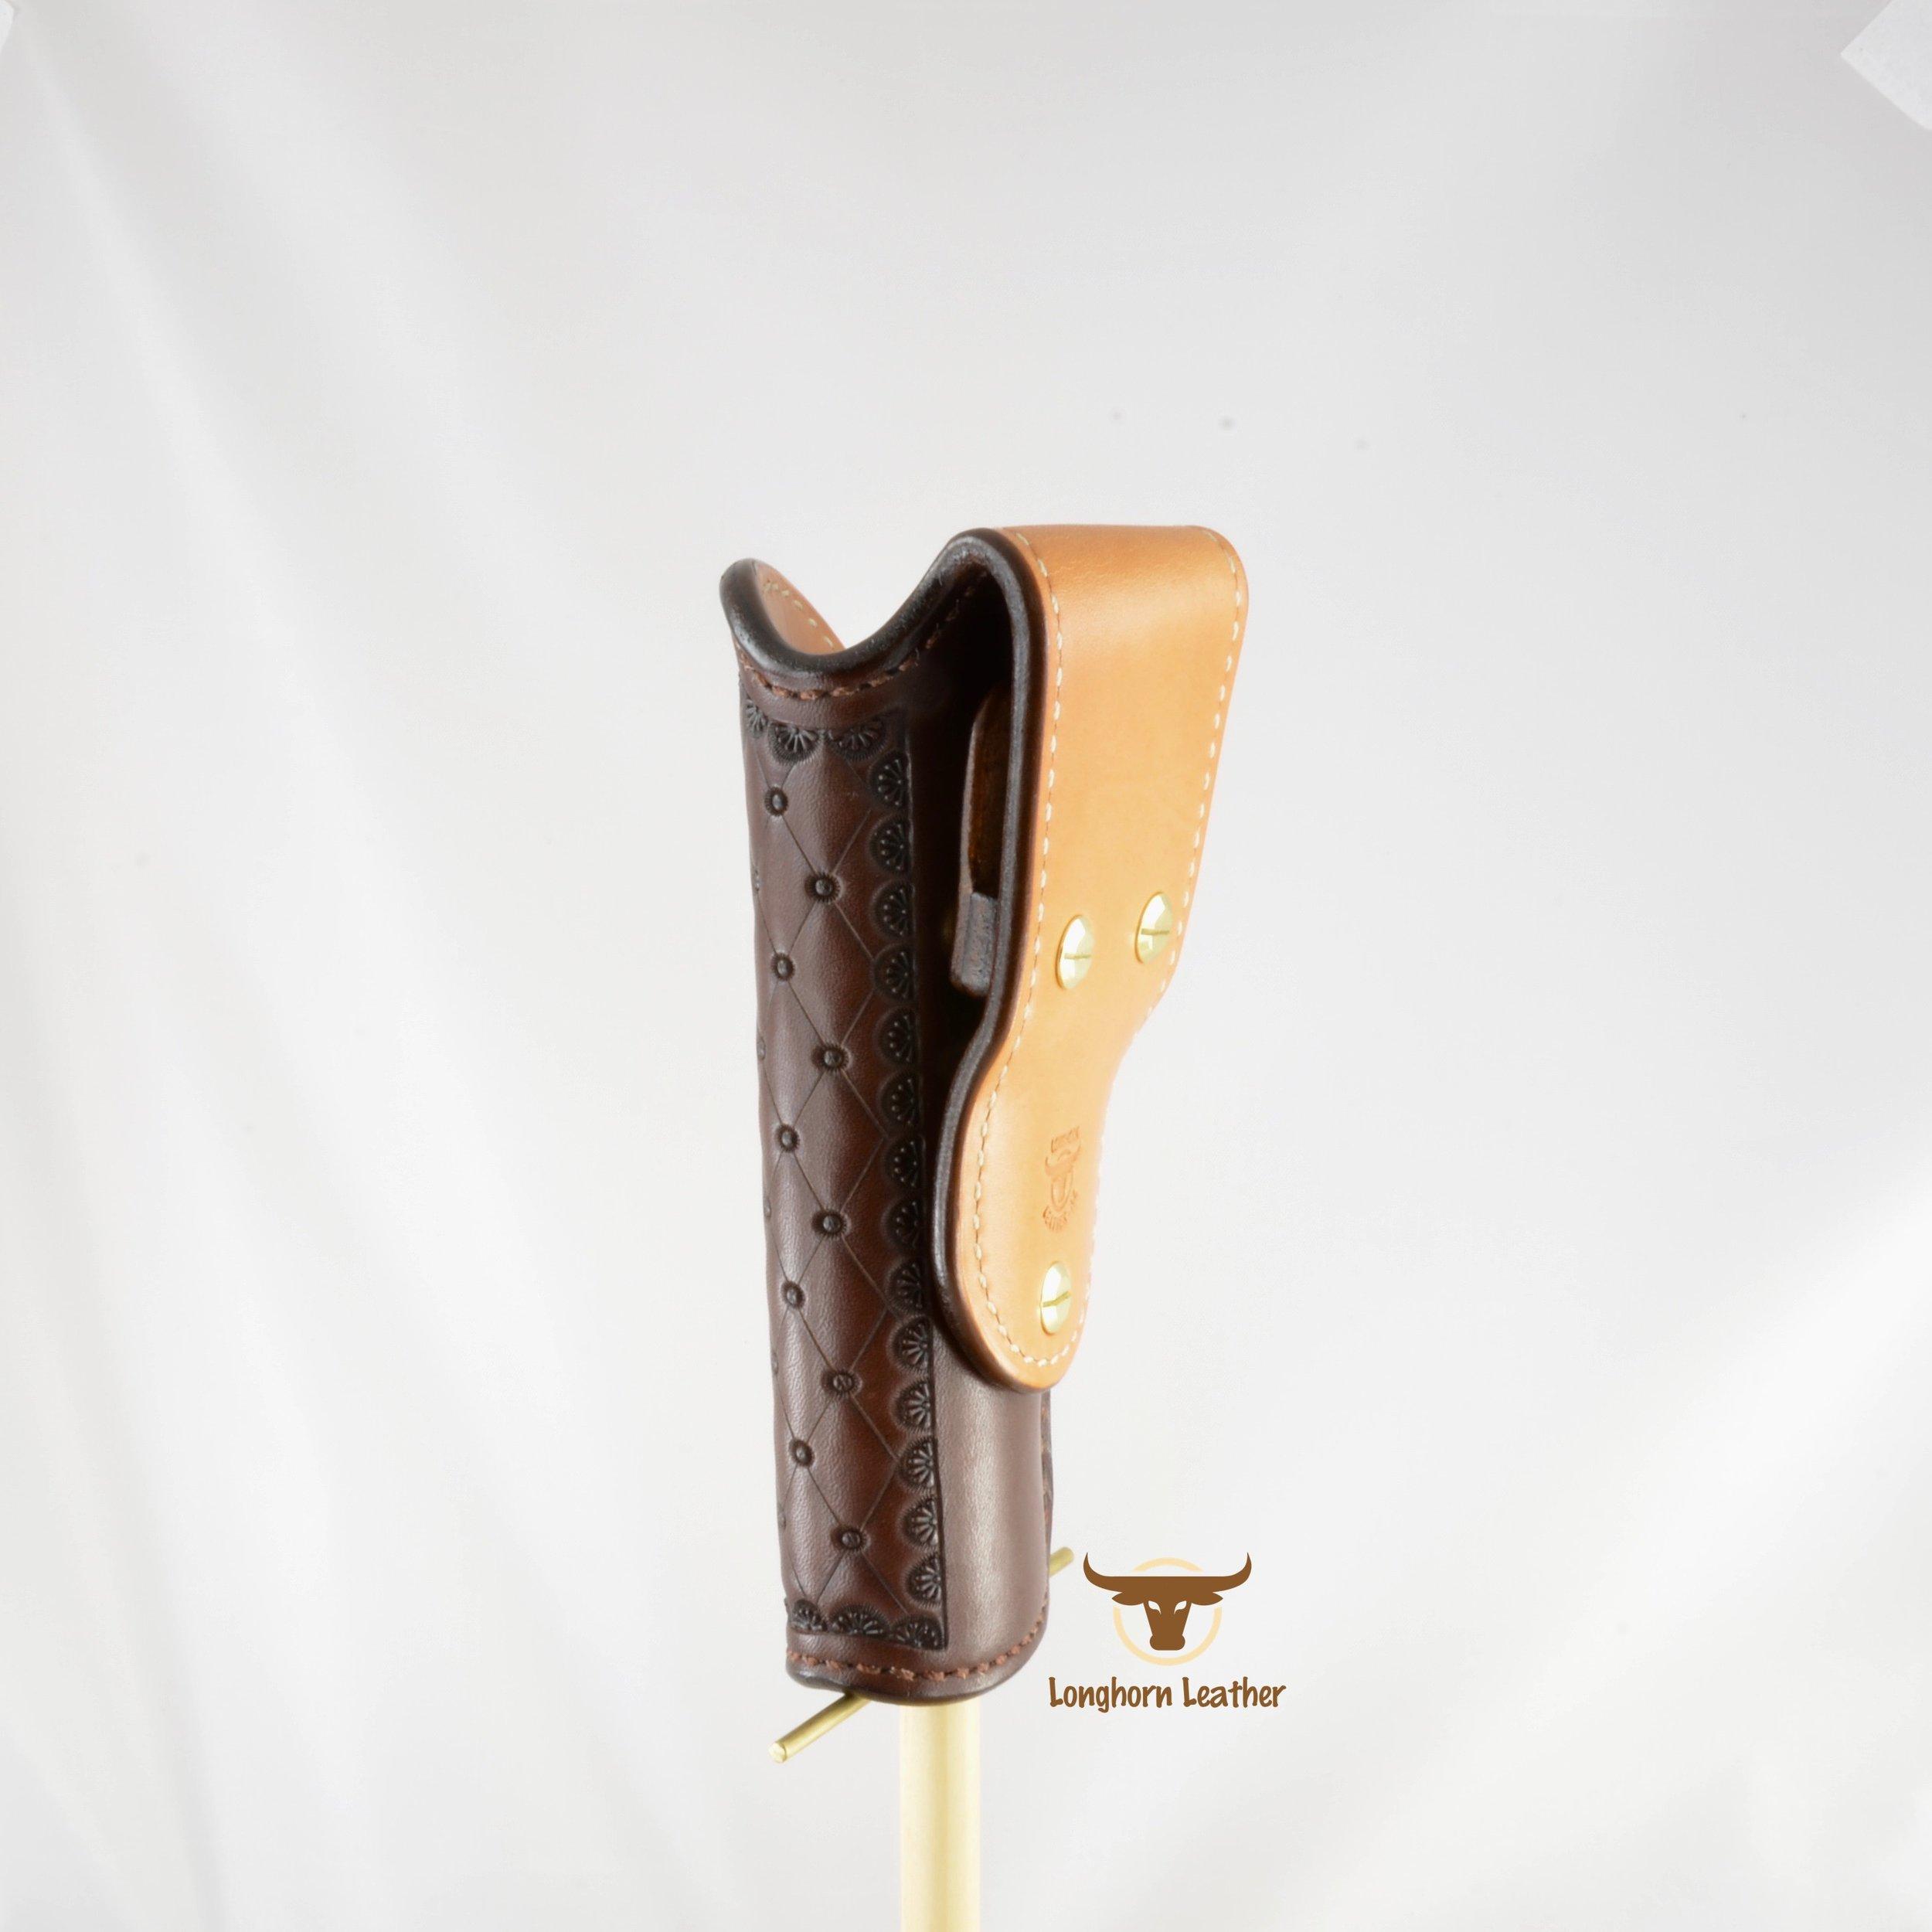 Longhorn Leather AZ - 1911 Holster featurng the %22San Carlos%22 design 7.jpg